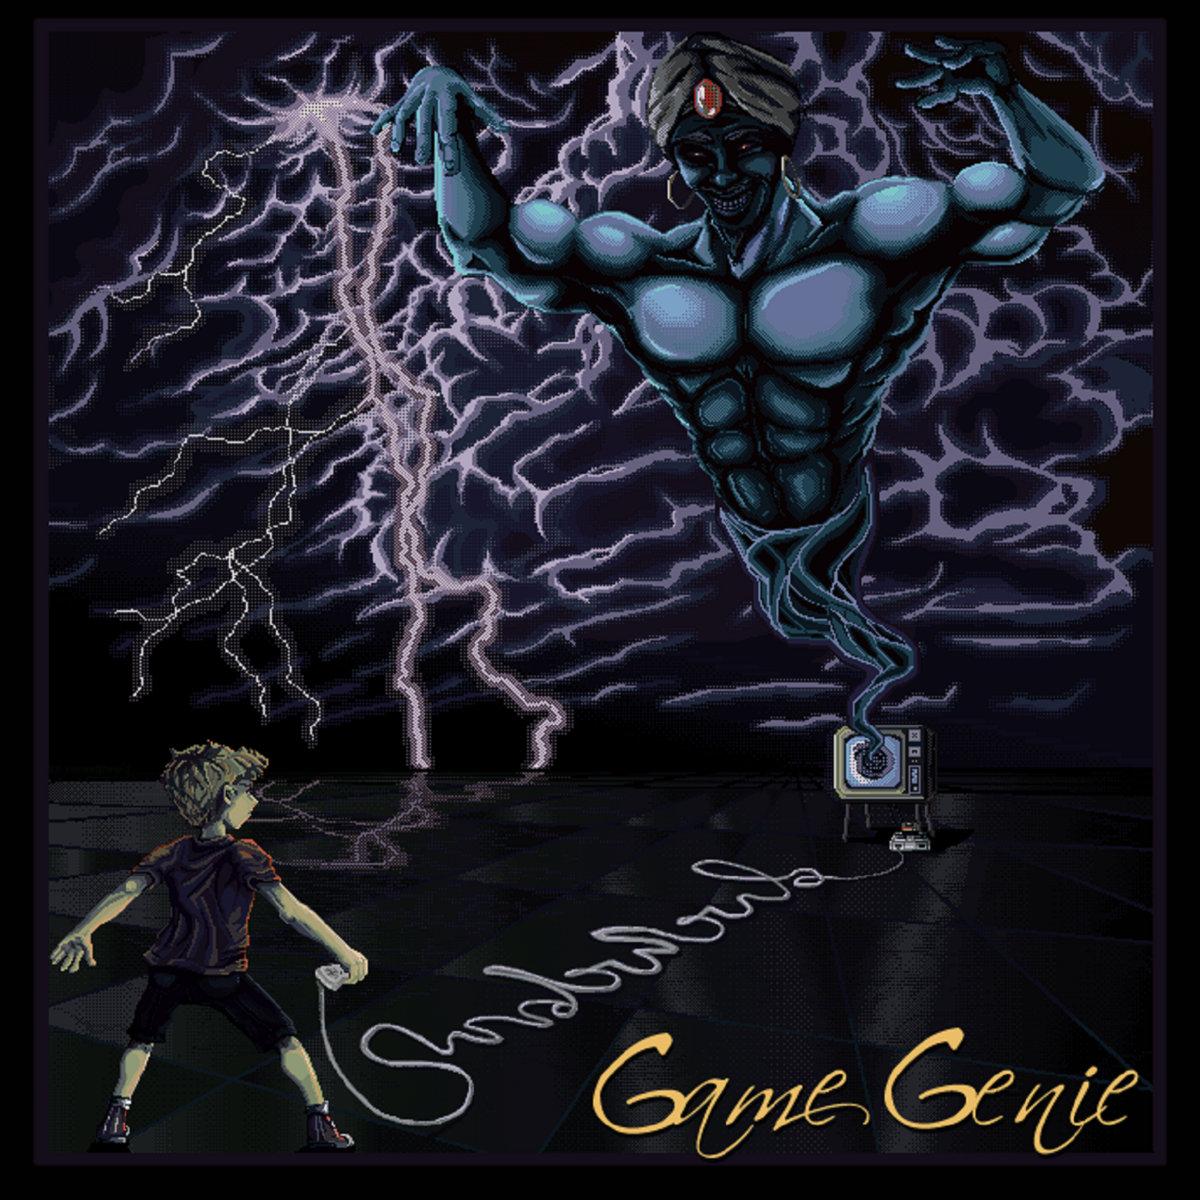 Game Genie | Shnabubula